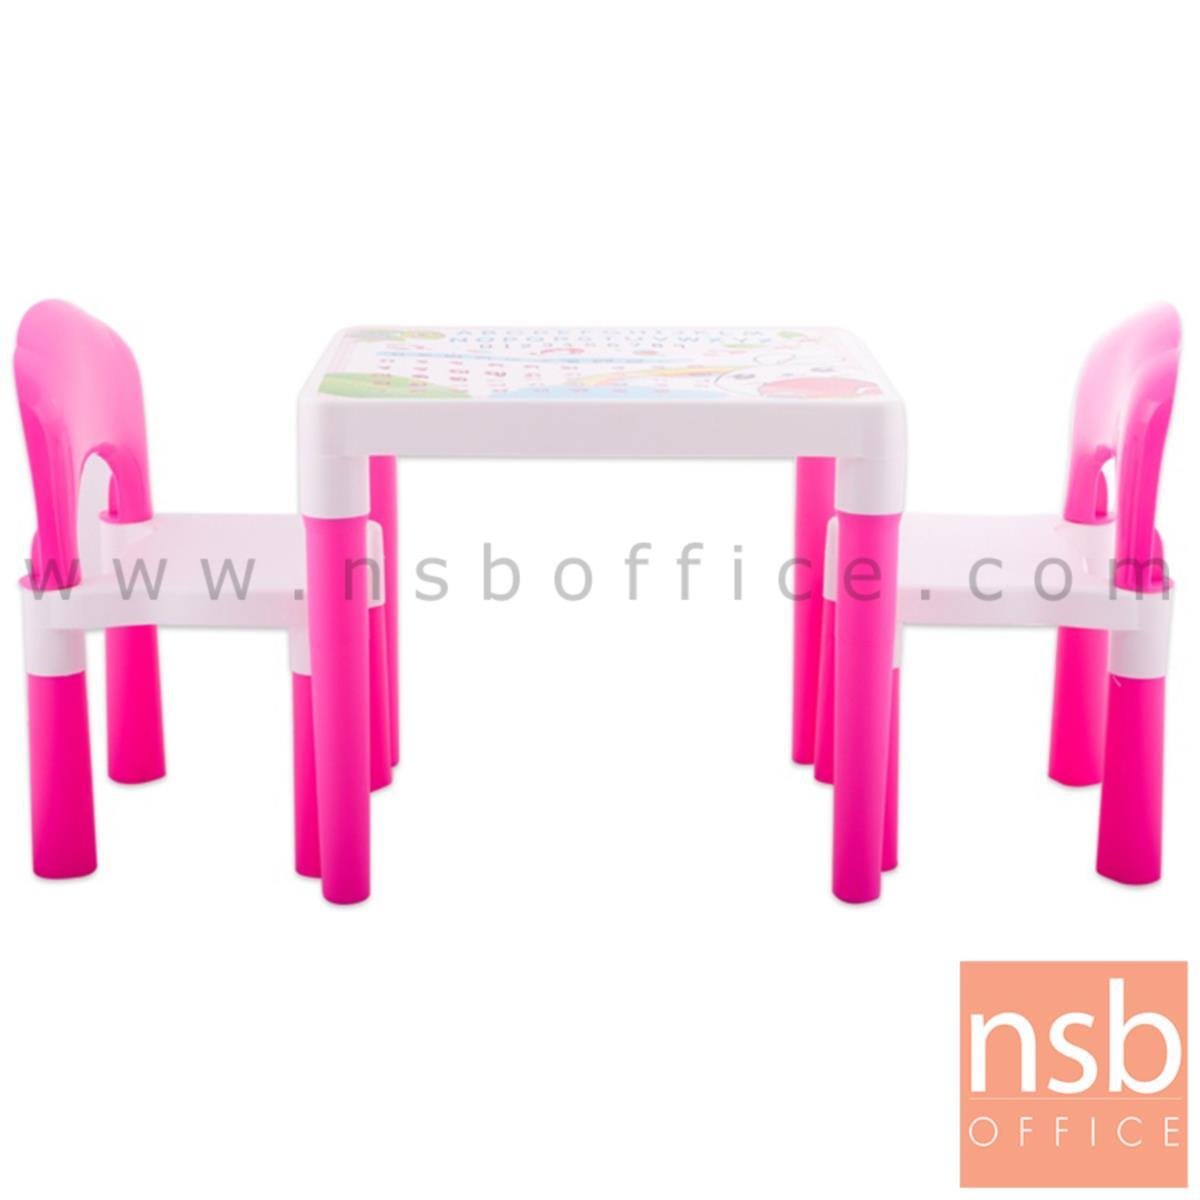 B10A069:ชุดเก้าอี้พลาสติกสำหรับเด็ก รุ่น FAMILY-SET_CHAIR (ประกอบด้วยโต๊ะ 1 เก้าอี้ 2 )